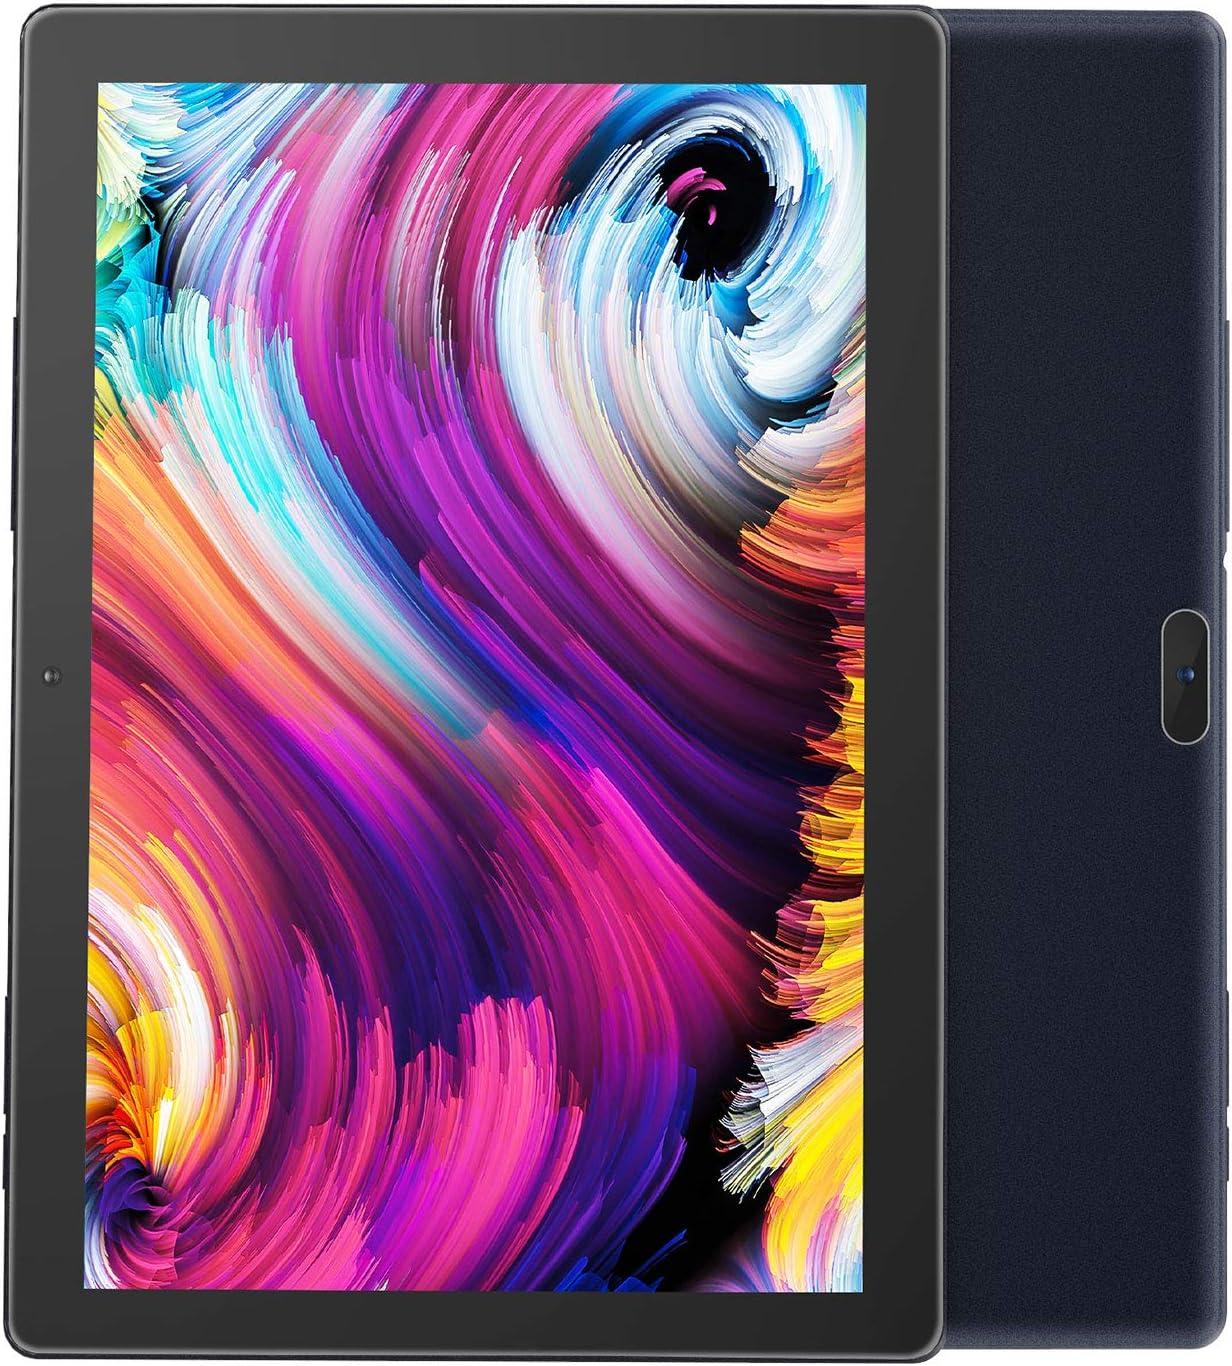 Android Tablet 10 inch,PRITOM M10, 2 GB RAM, 32 GB Android 9.0 Tablet,10.1 inch IPS HD Display,GPS,FM, Quad-Core Processor,Wi-Fi (M10 Black)